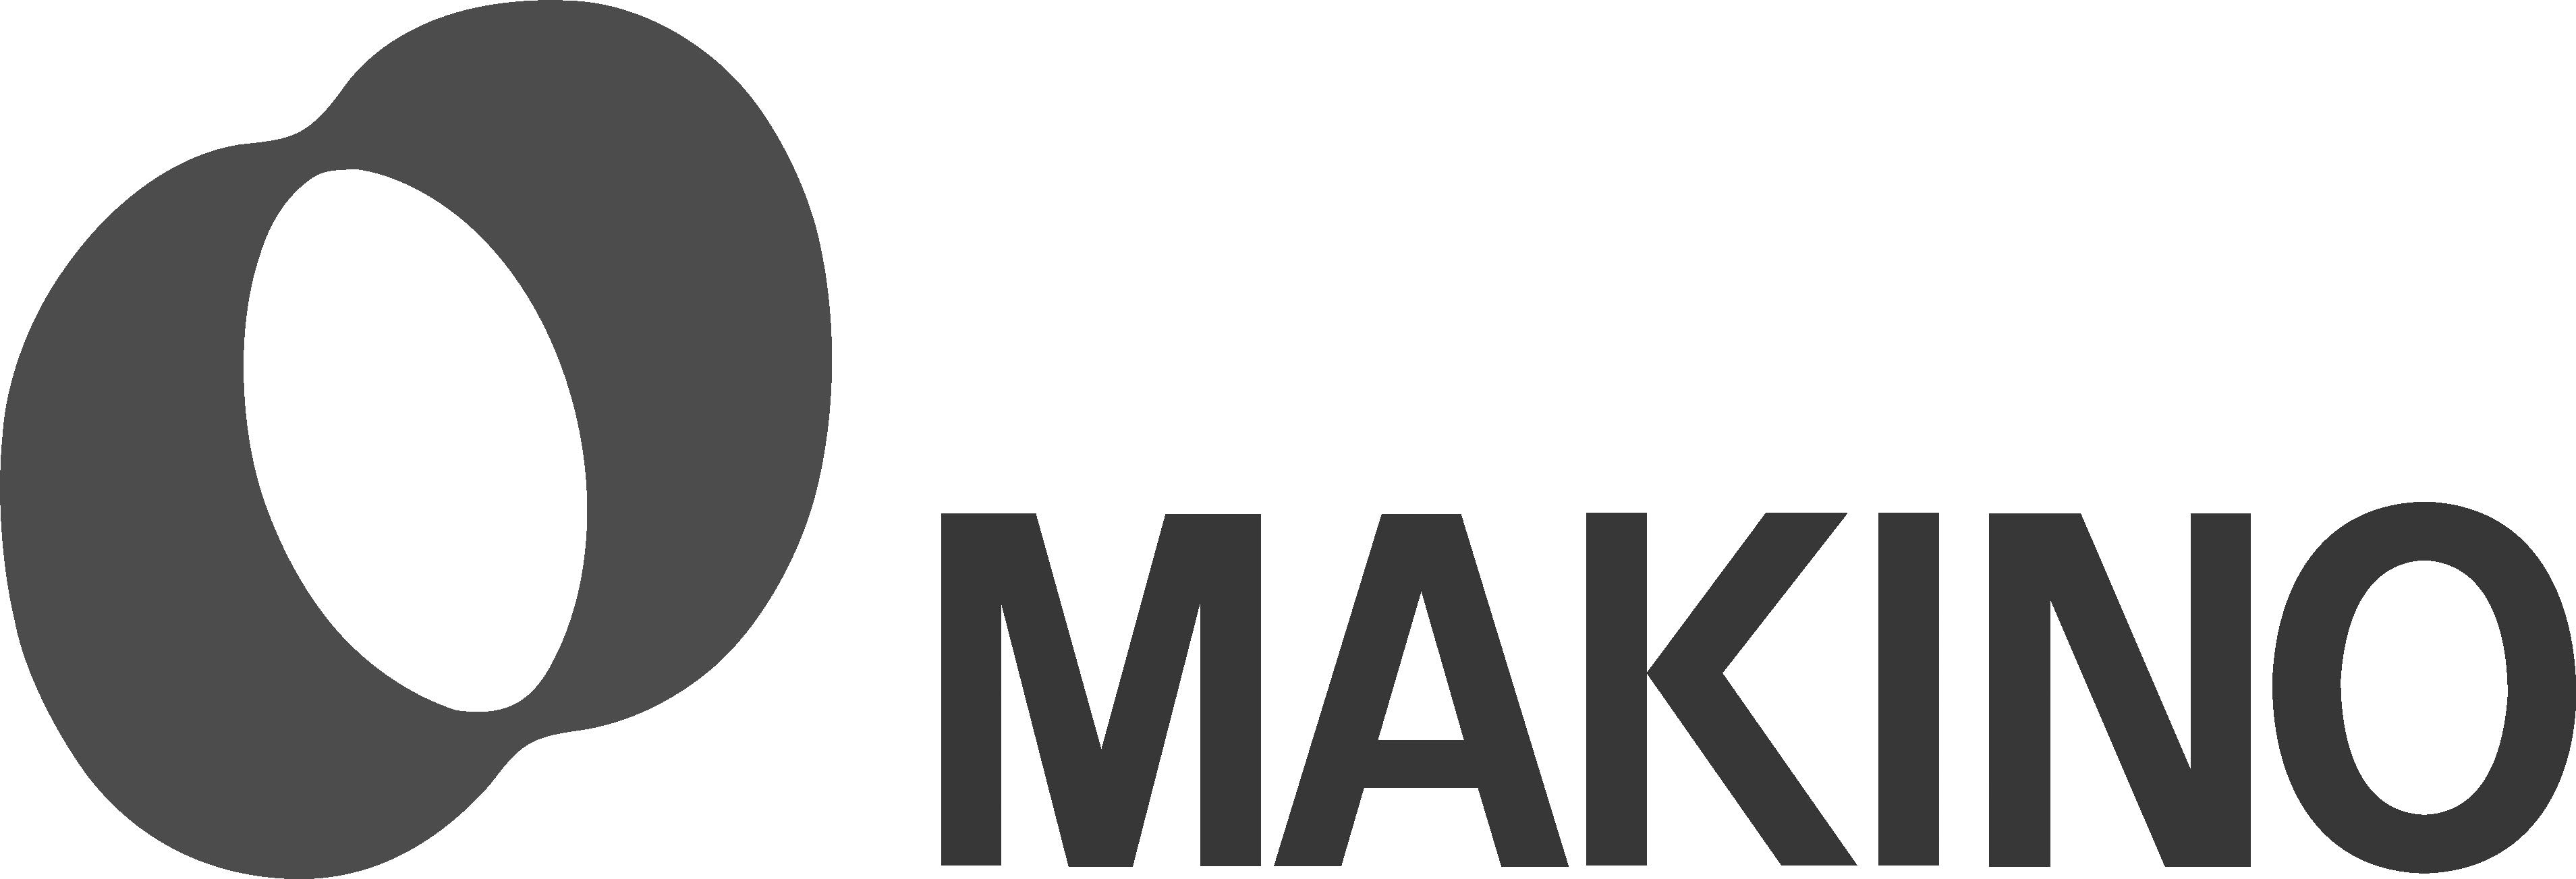 Logo_Makino_4C_A4_schwarz_weiss